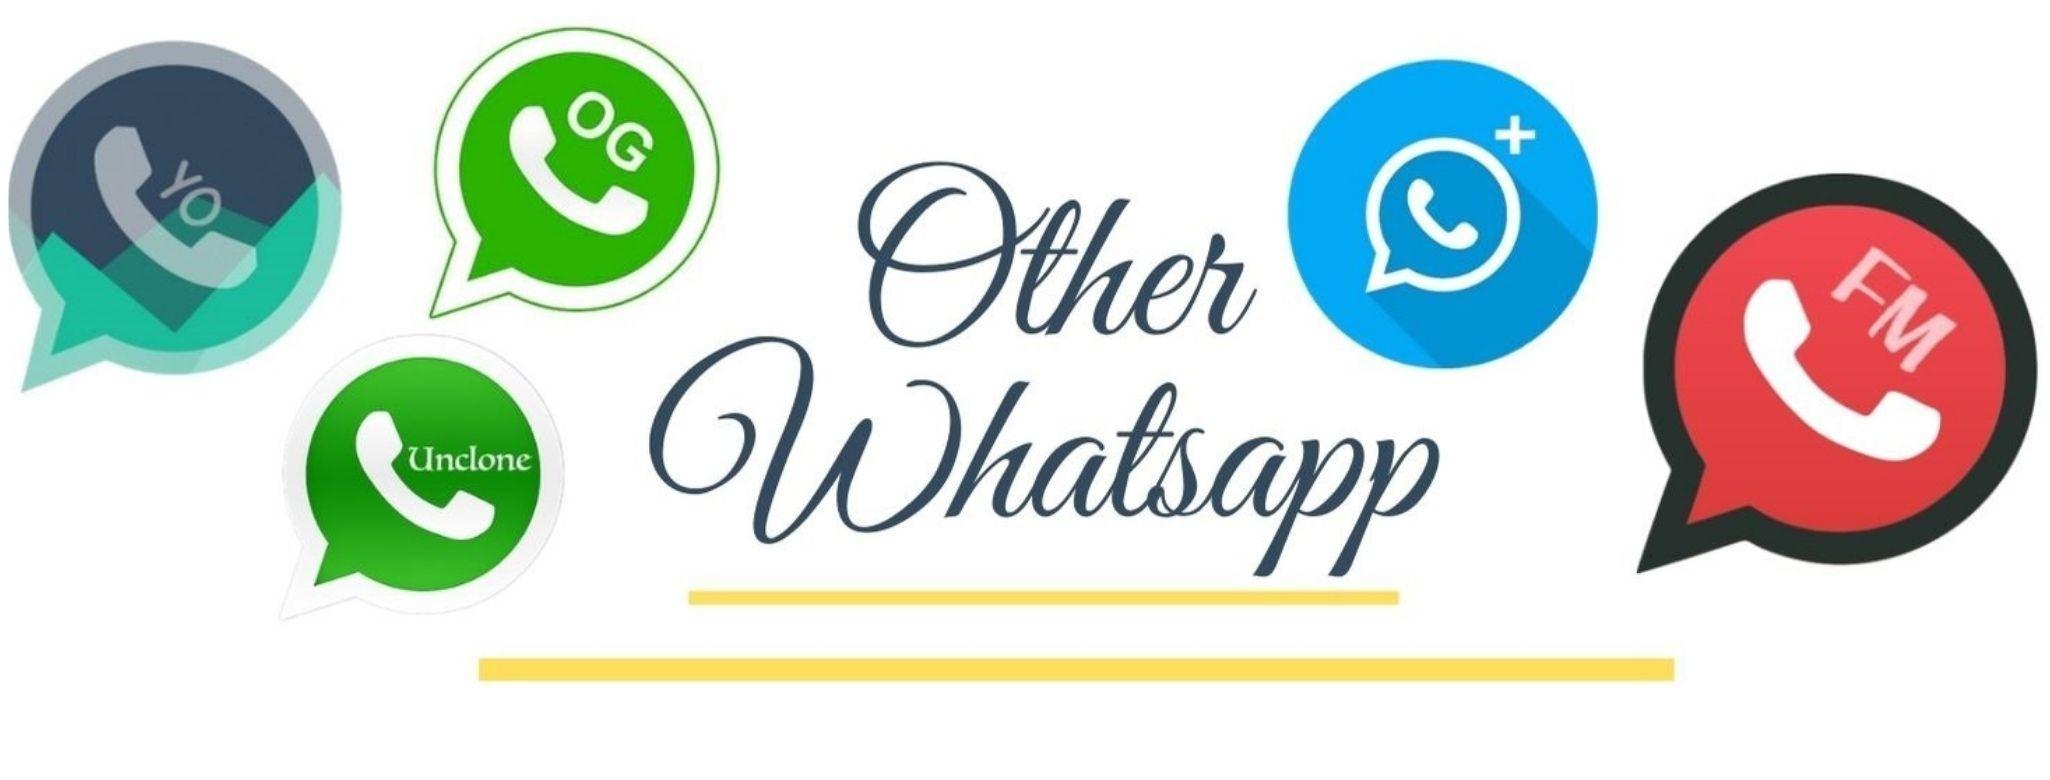 Otherwhatsapp (@otherwhatsapp) Cover Image